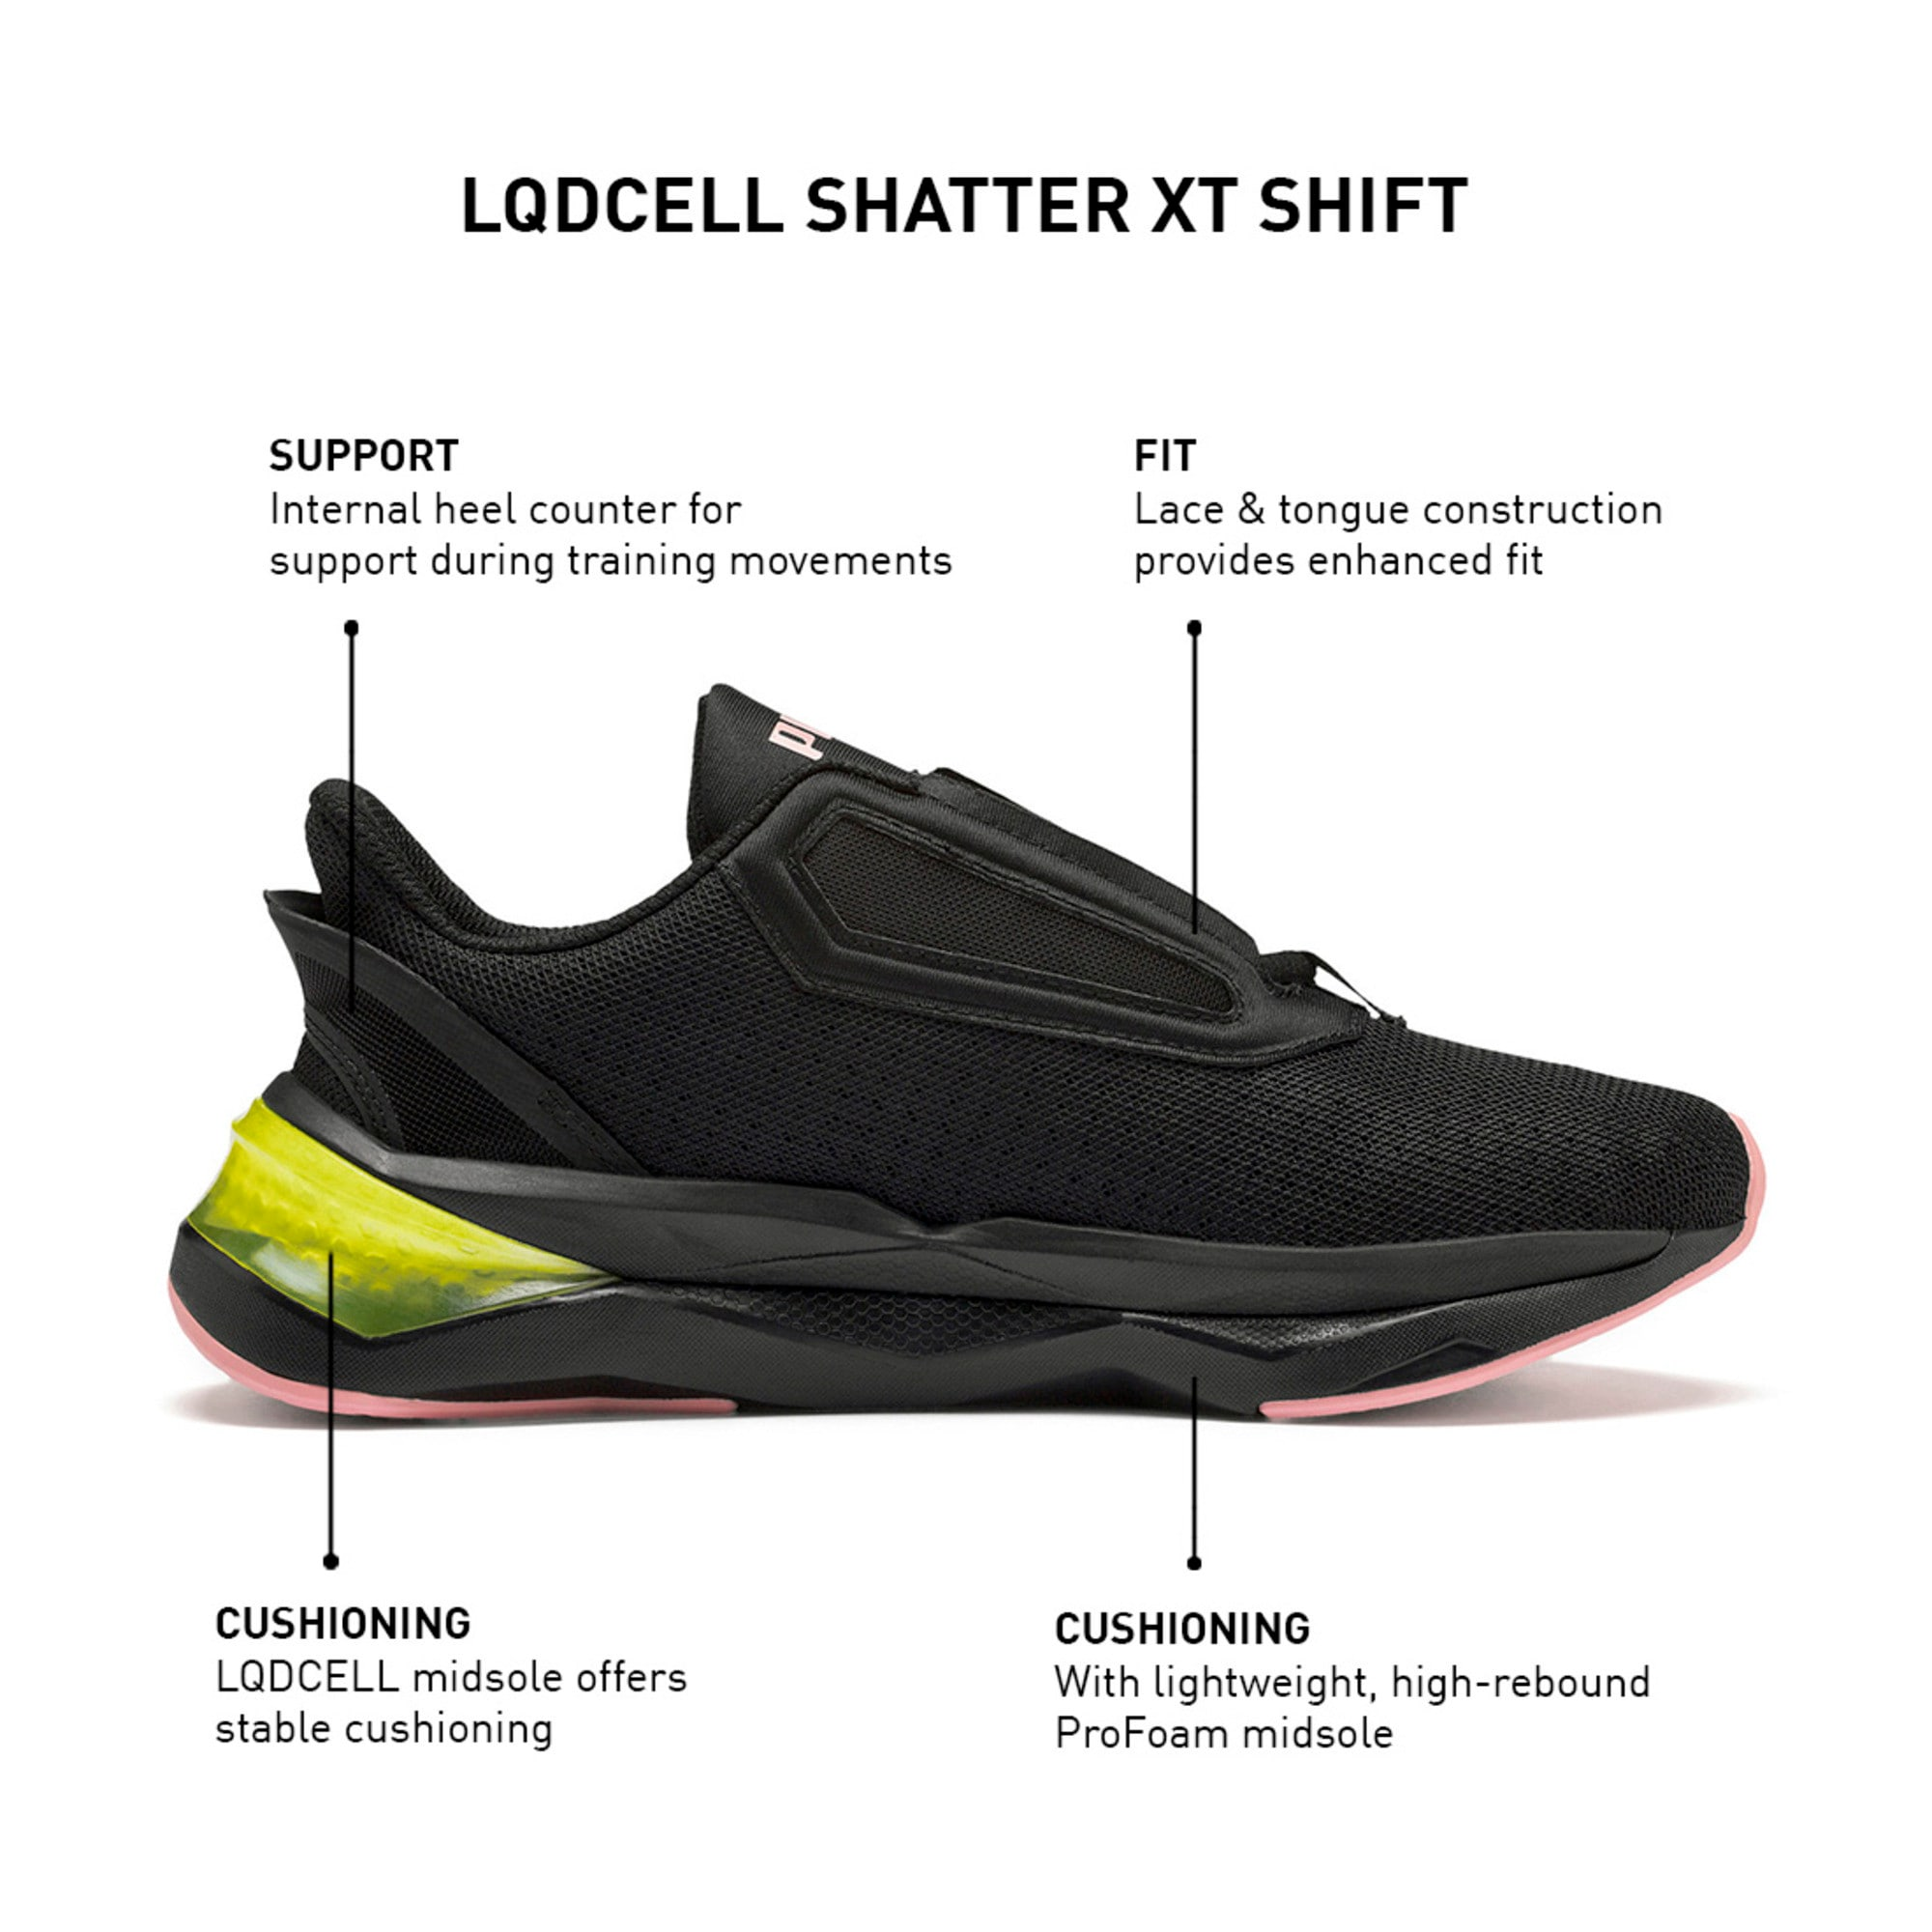 Thumbnail 10 of LQDCELL Shatter XT Women's Training Shoes, Puma Black-Yellow Alert, medium-IND